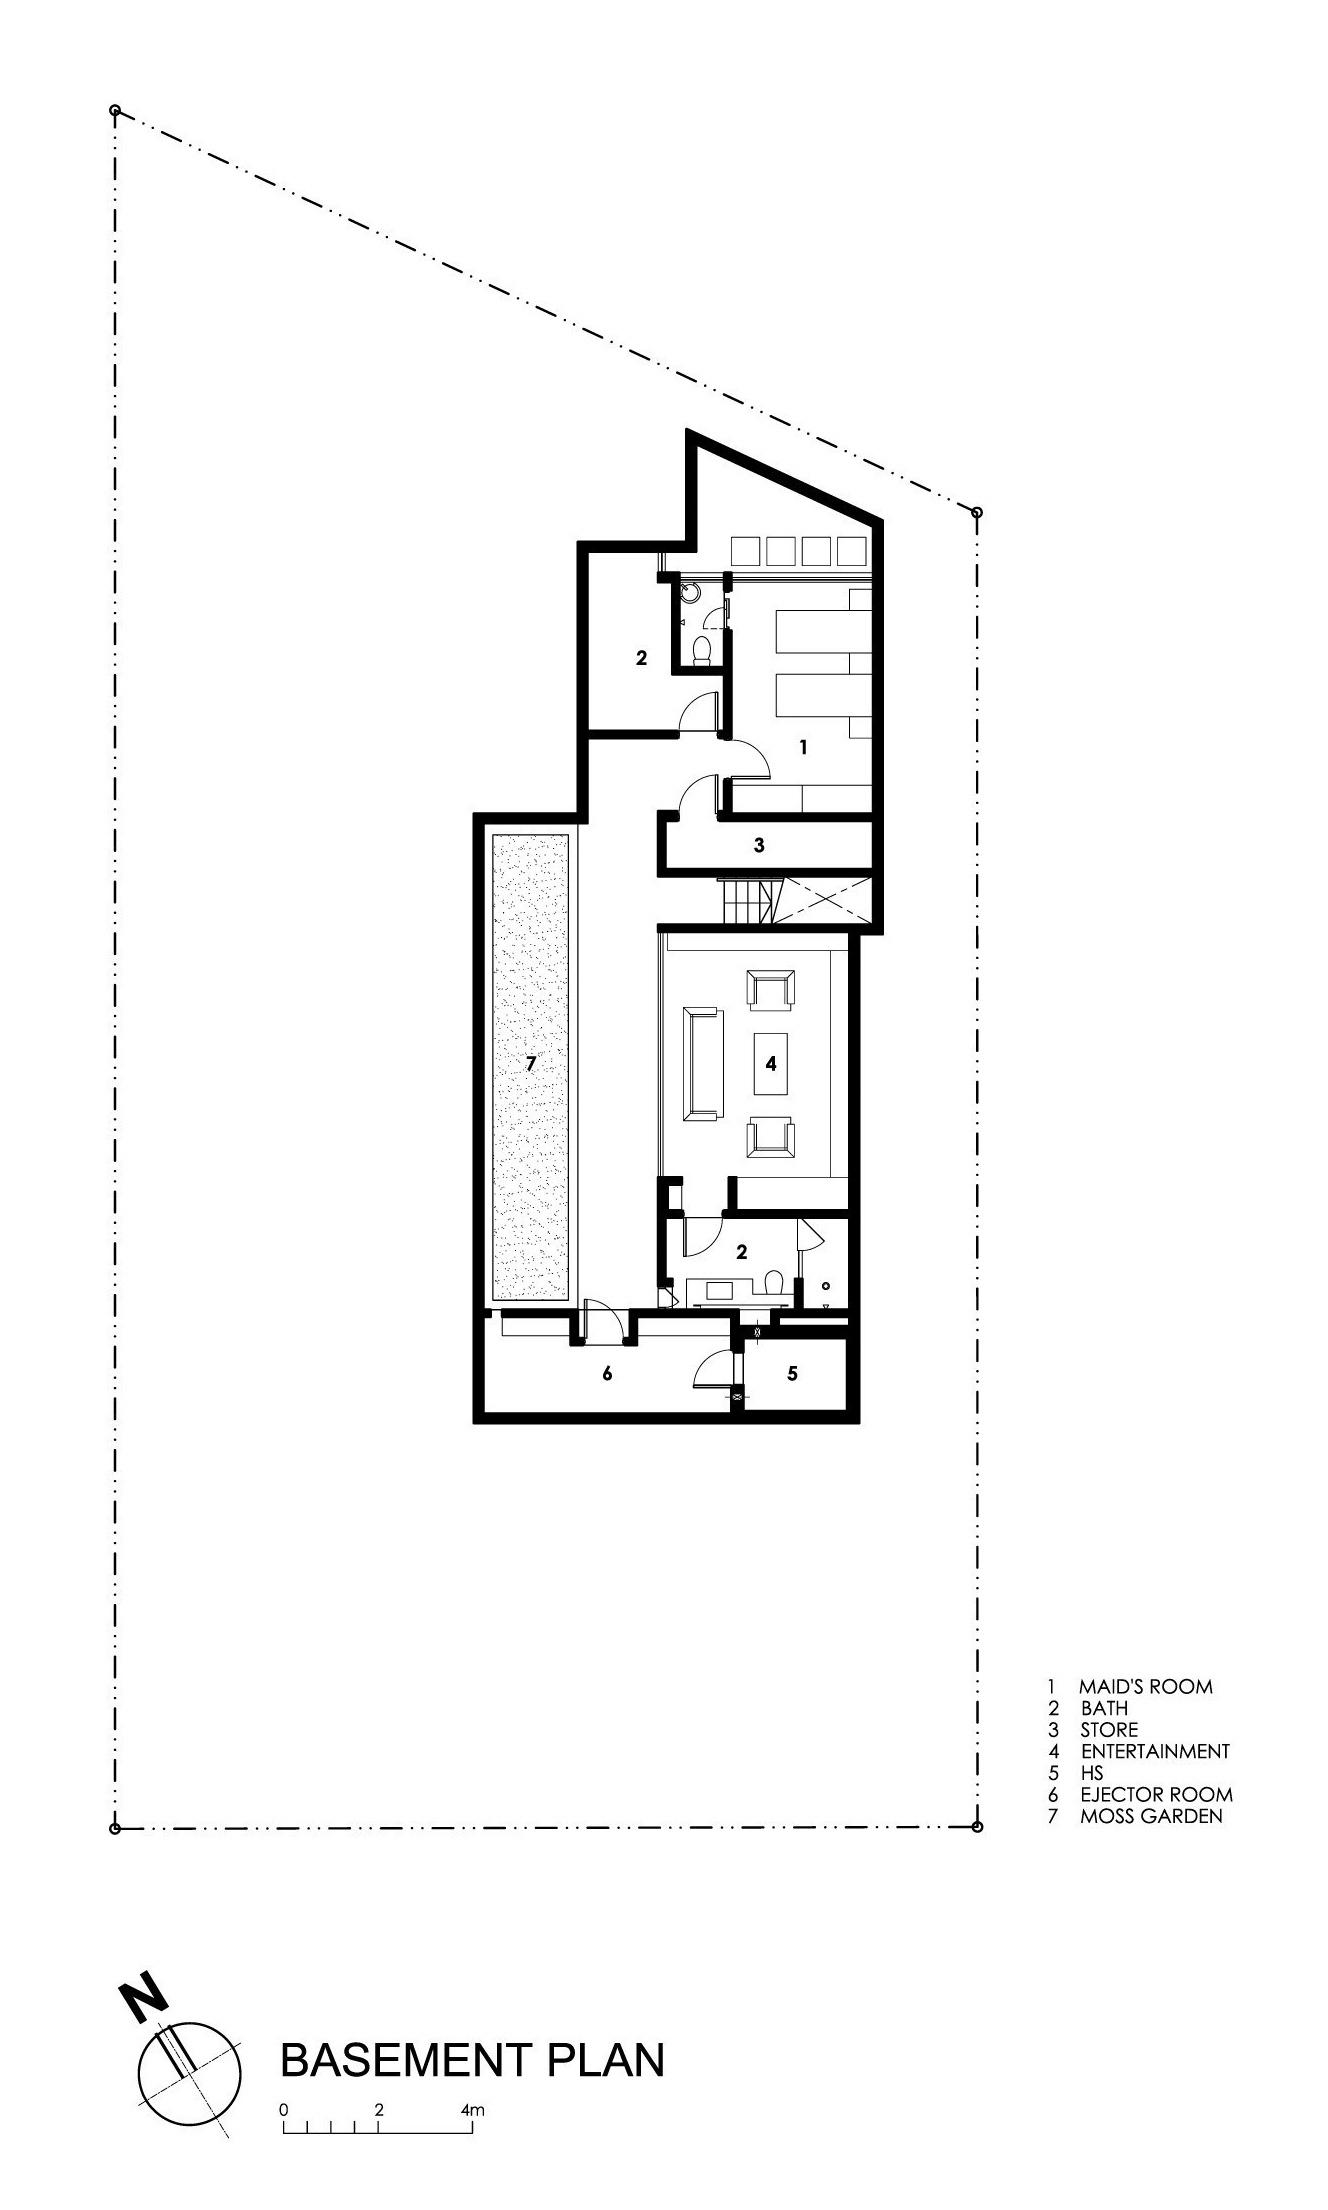 Basement Floor Plan – Travertine Dream House Luxury Residence – Serangoon, Singapore